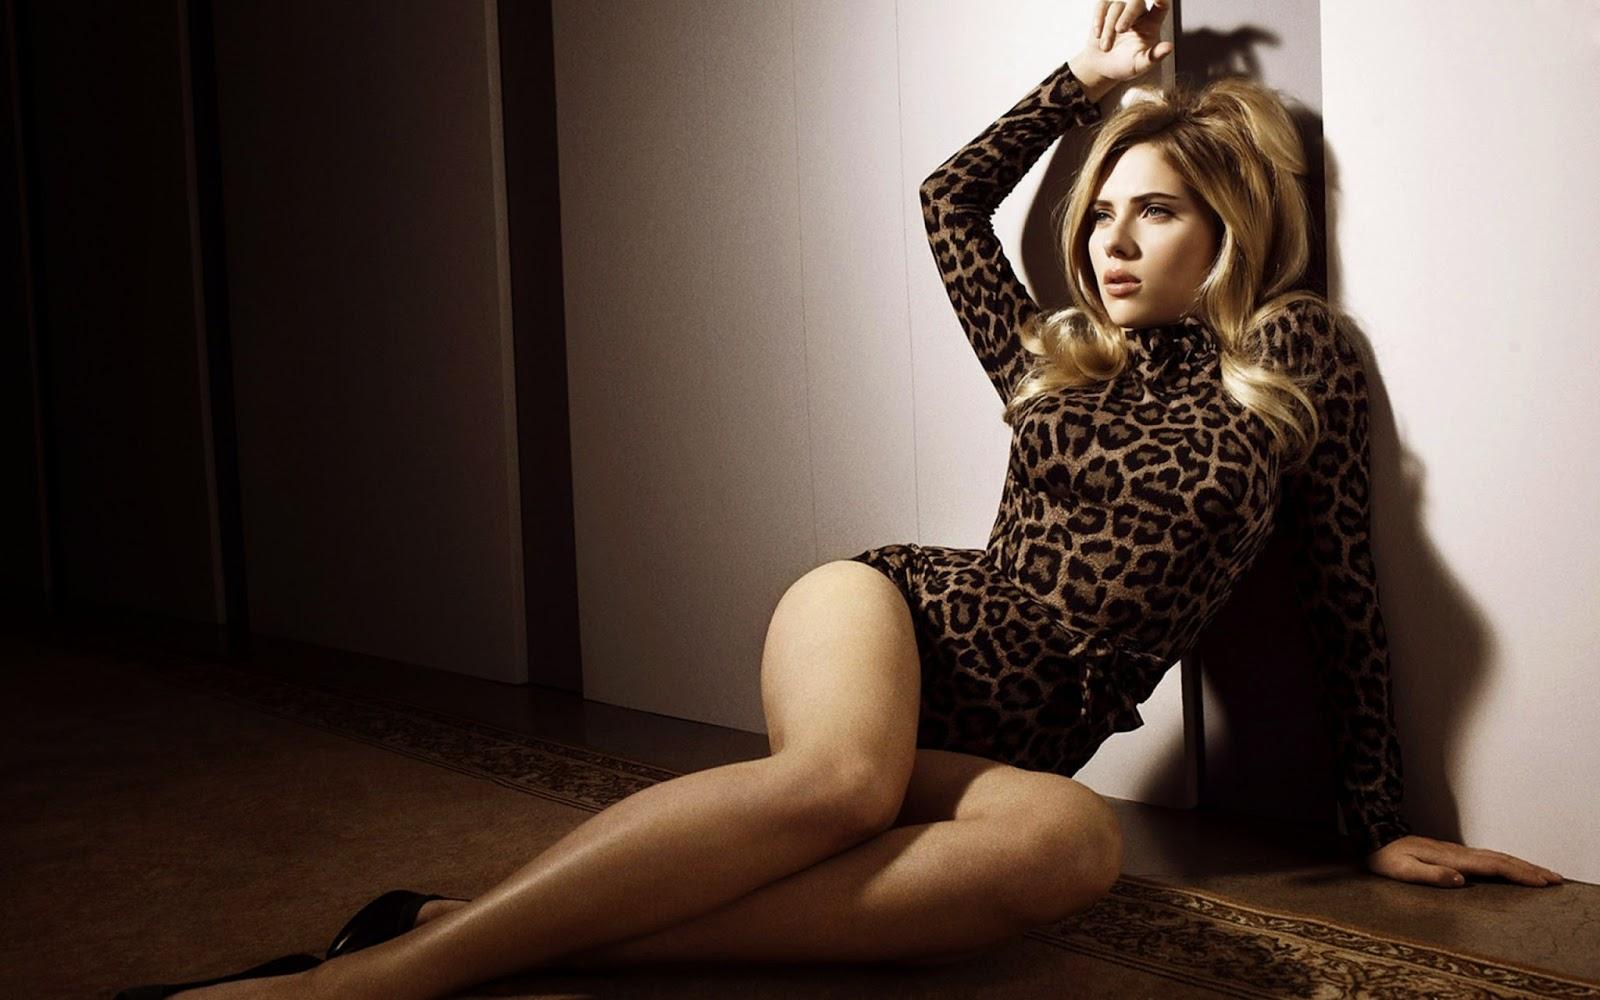 Scarlett Johansson in Photoshoot Wallpaper Free Download